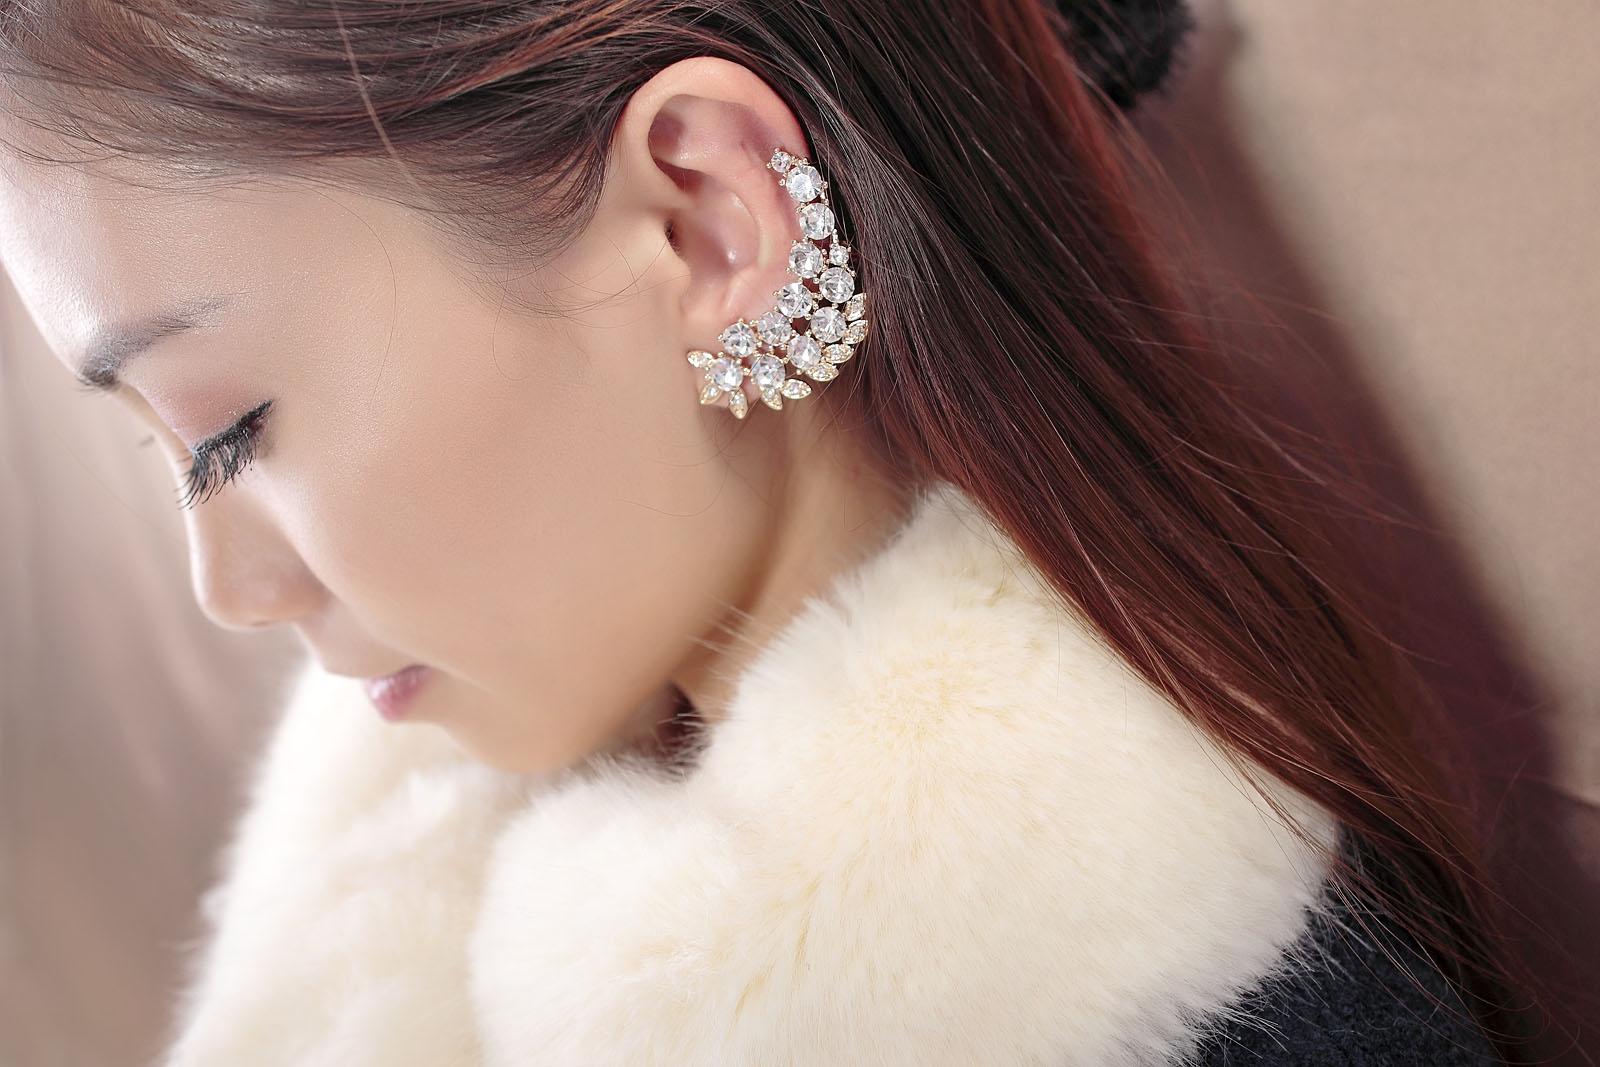 crystal-cartilage-ear-cuff-earrings.jpg_1097337557